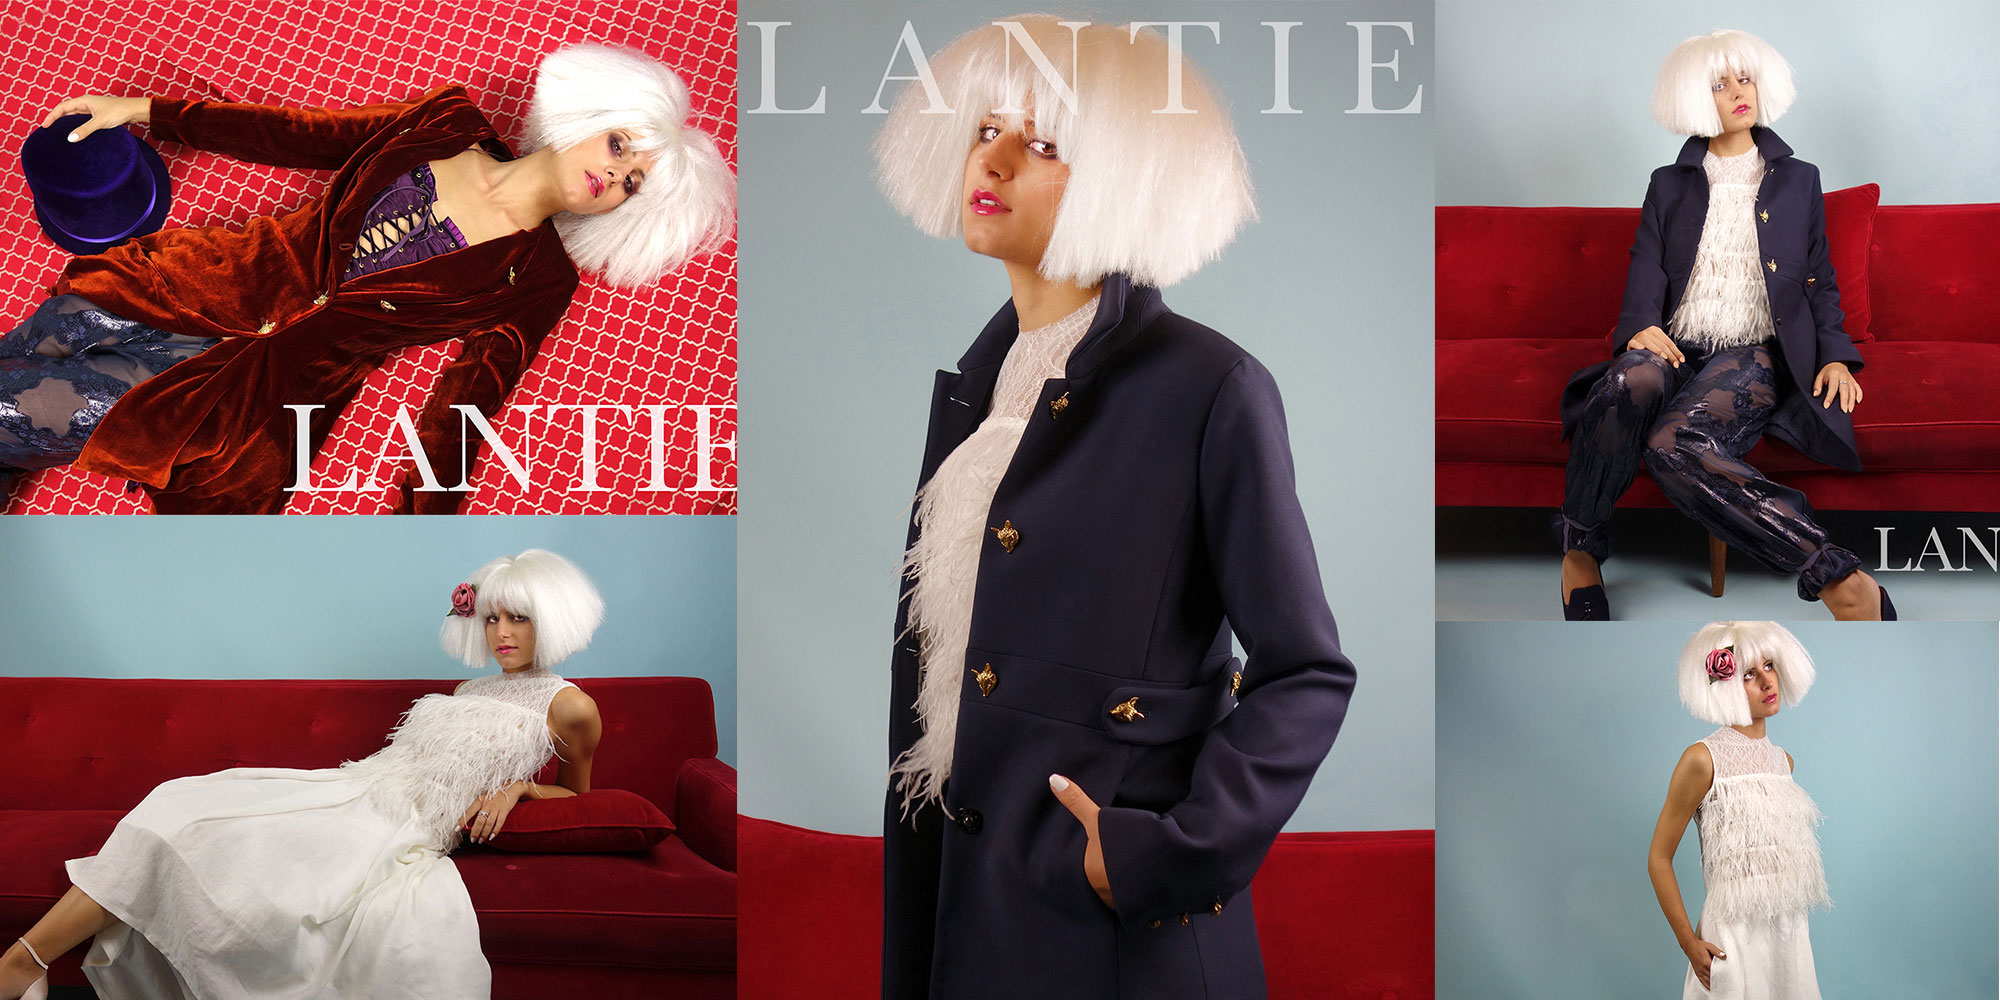 freelance_fashion_illustrations_fashion_illustrator_Lantie.com7a